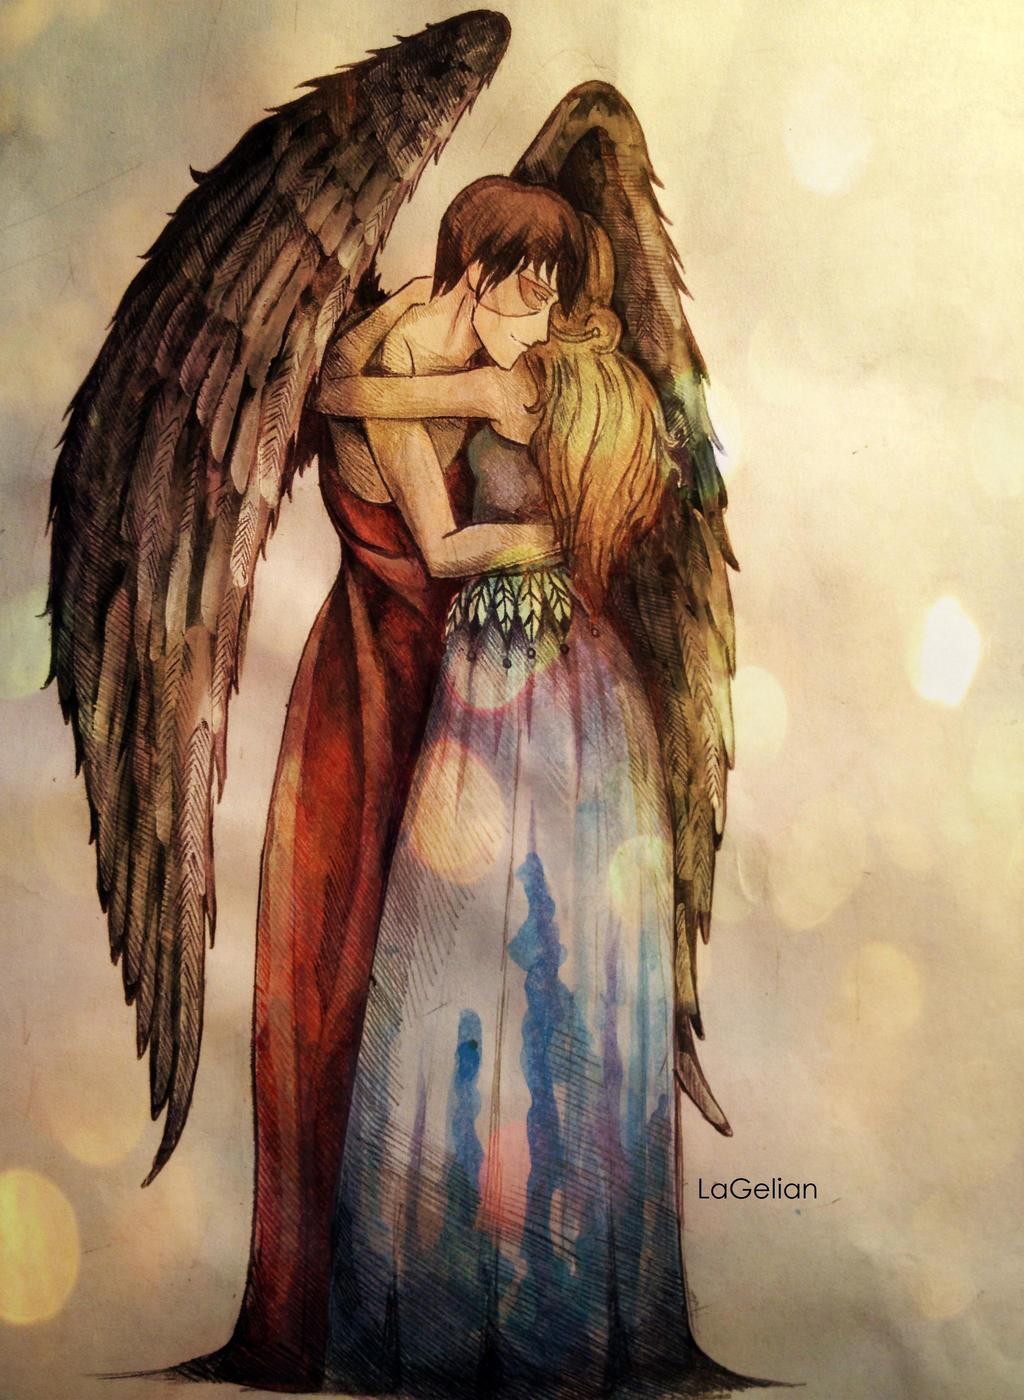 Your Guardian Angel by LaGelian on DeviantArt